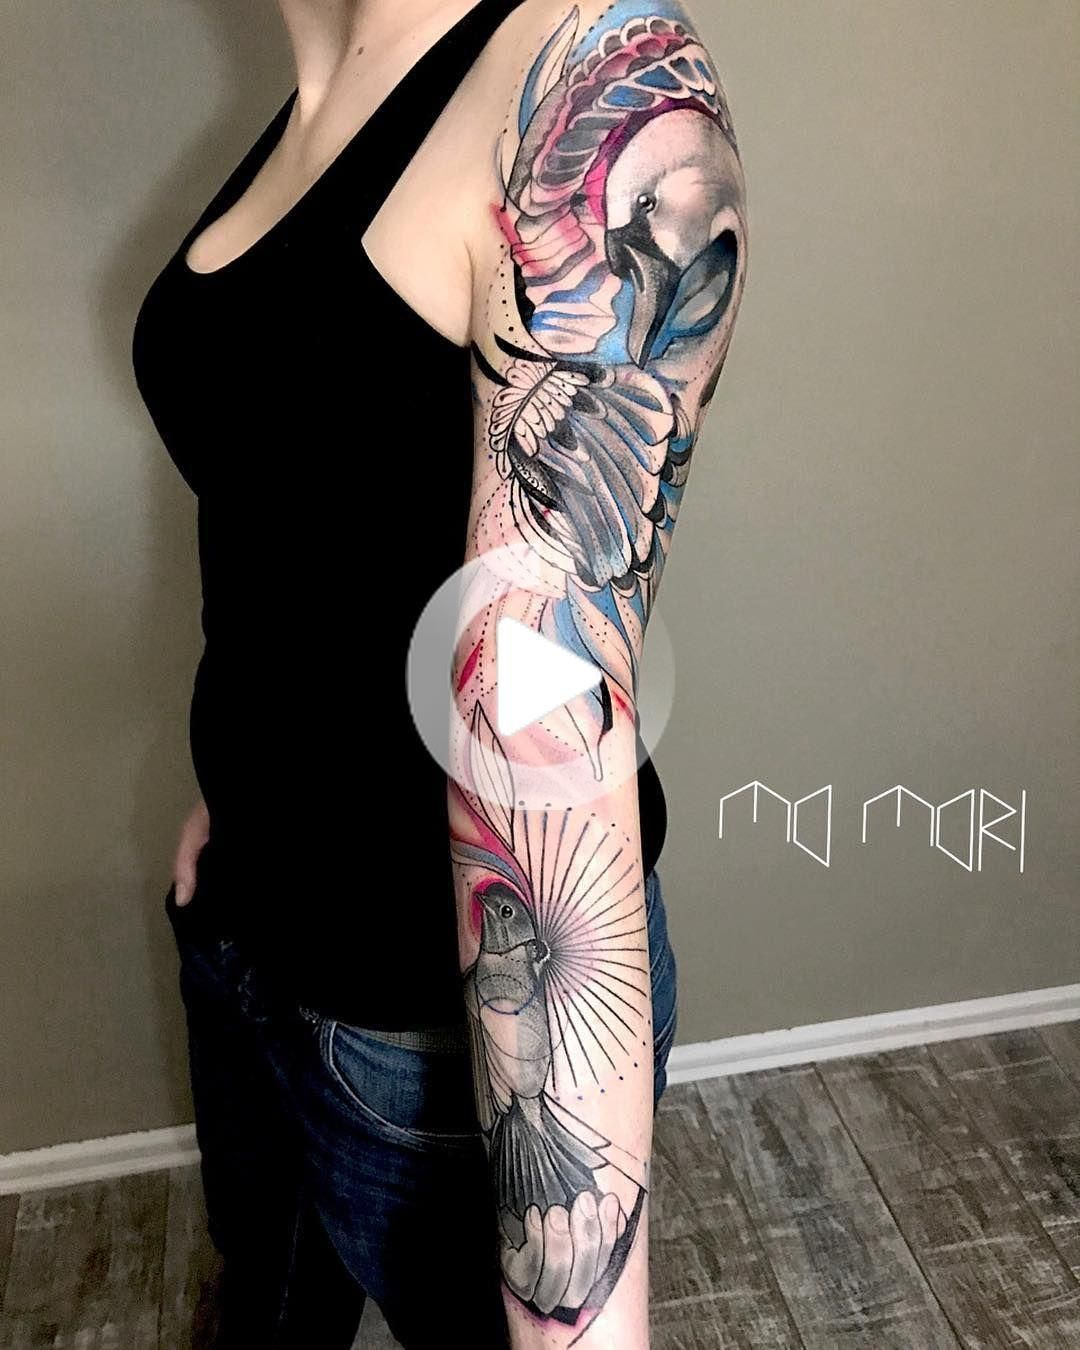 Tattoo artist Mo Mori authors style sketch watercolor tattoo | Germany, Berlin | #inkpplcom #colortattoo #sketch #watercolor #brighttattoo #sketchstyletattoo #fullcolortattoo #animalstattoo #authorsstyle